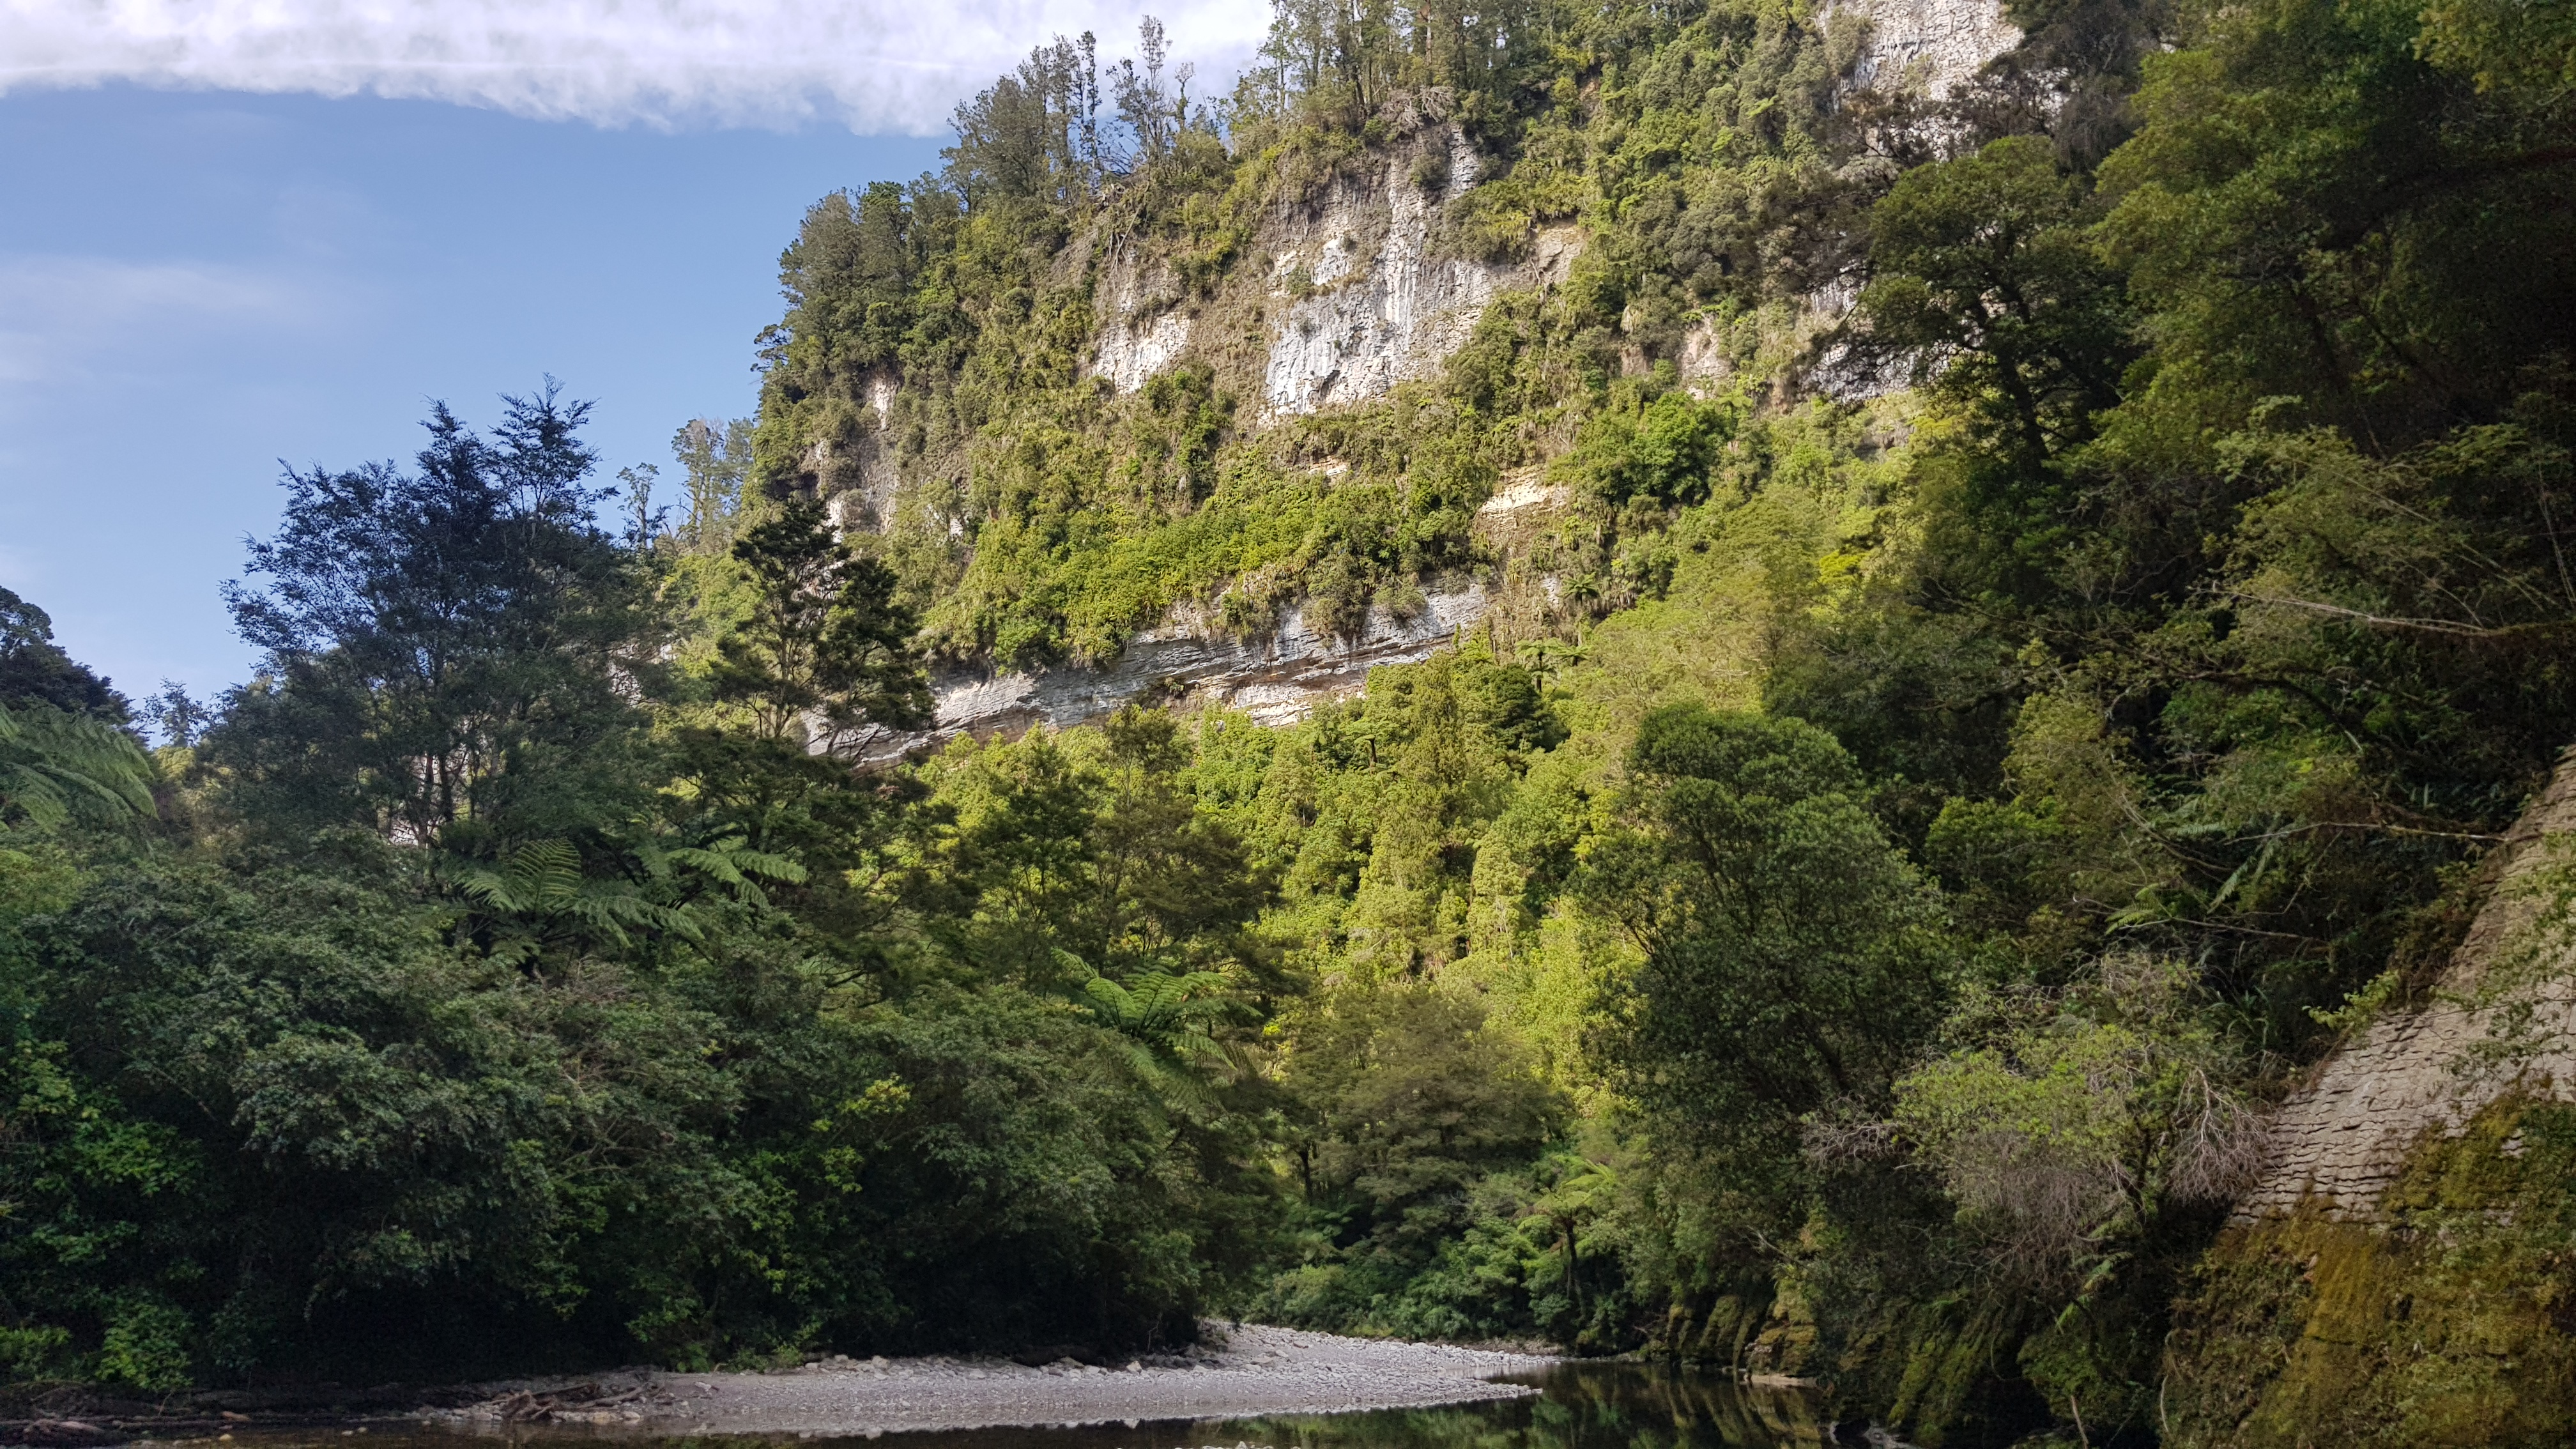 Dilemma Creek - Inland Pack Track